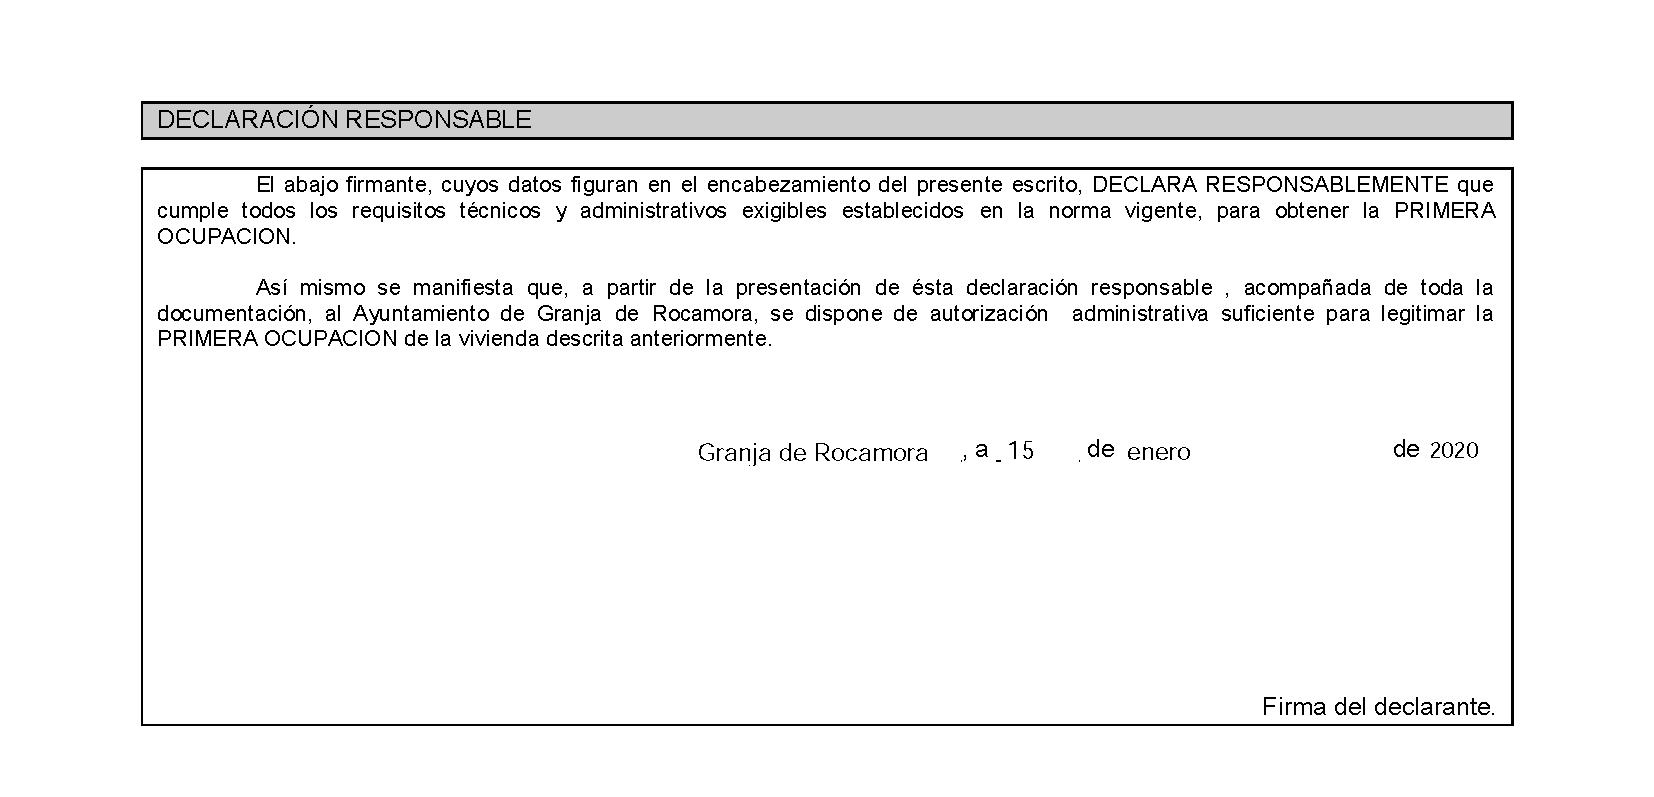 Impreso Declaración Responsable Segunda Ocupación Granja de Rocamora